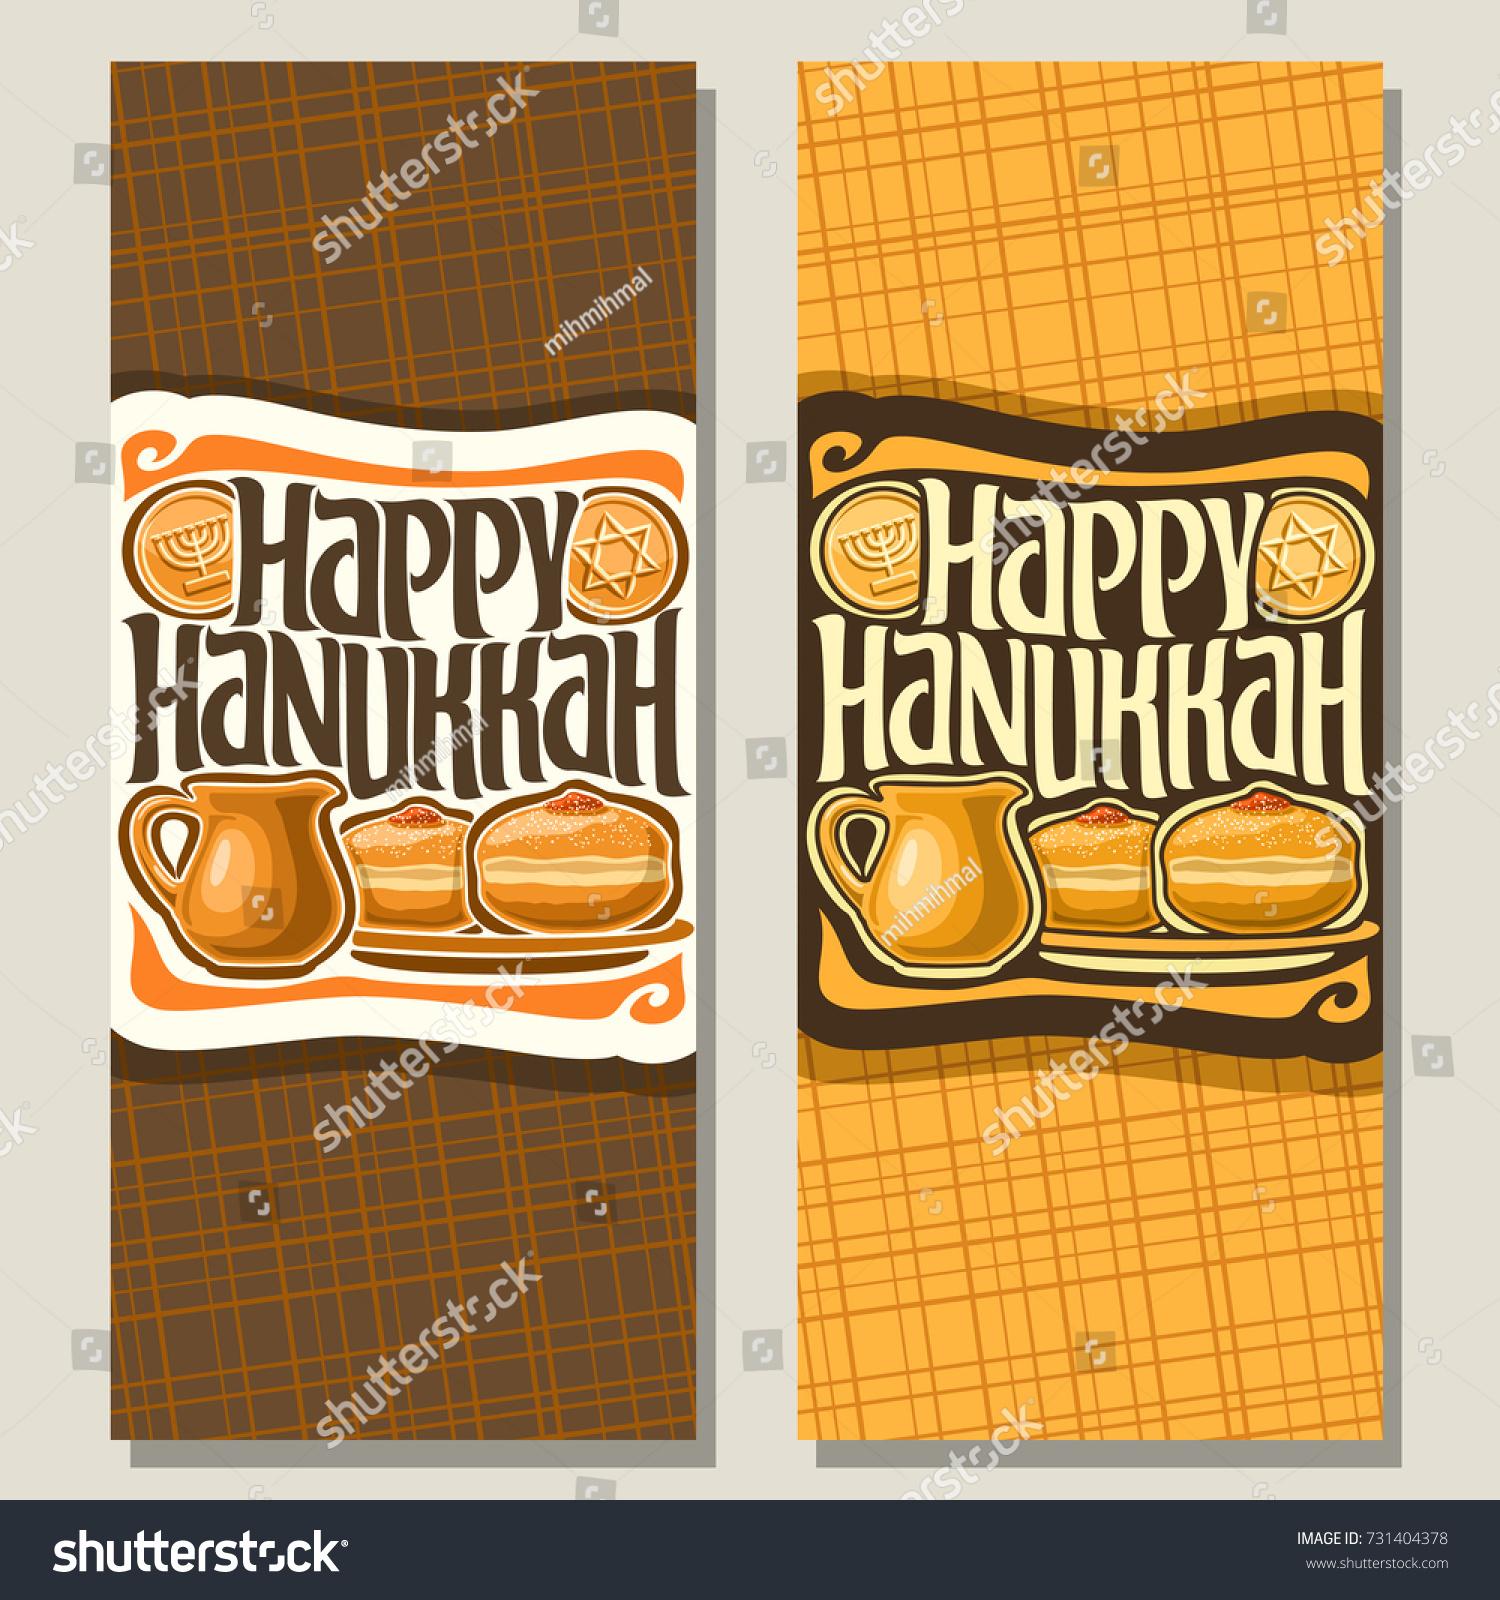 Vector vertical banners hanukkah holiday greeting stock vector vector vertical banners for hanukkah holiday greeting cards with chocolate gelt coins oil jug m4hsunfo